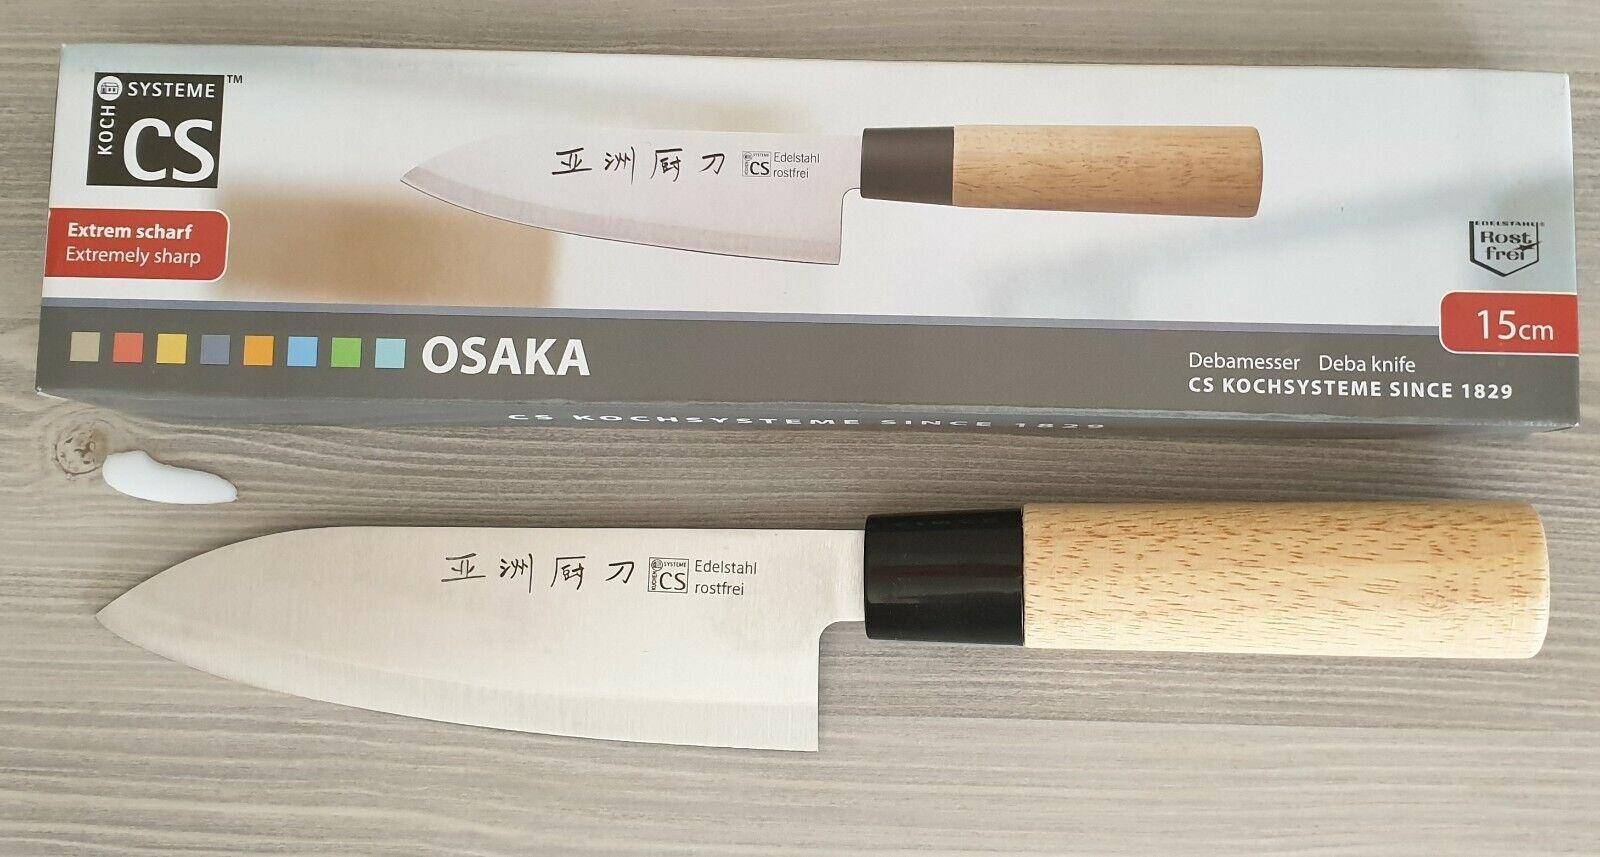 Osaka Debamesser - Kochmesser -  Klingenlänge 15 cm